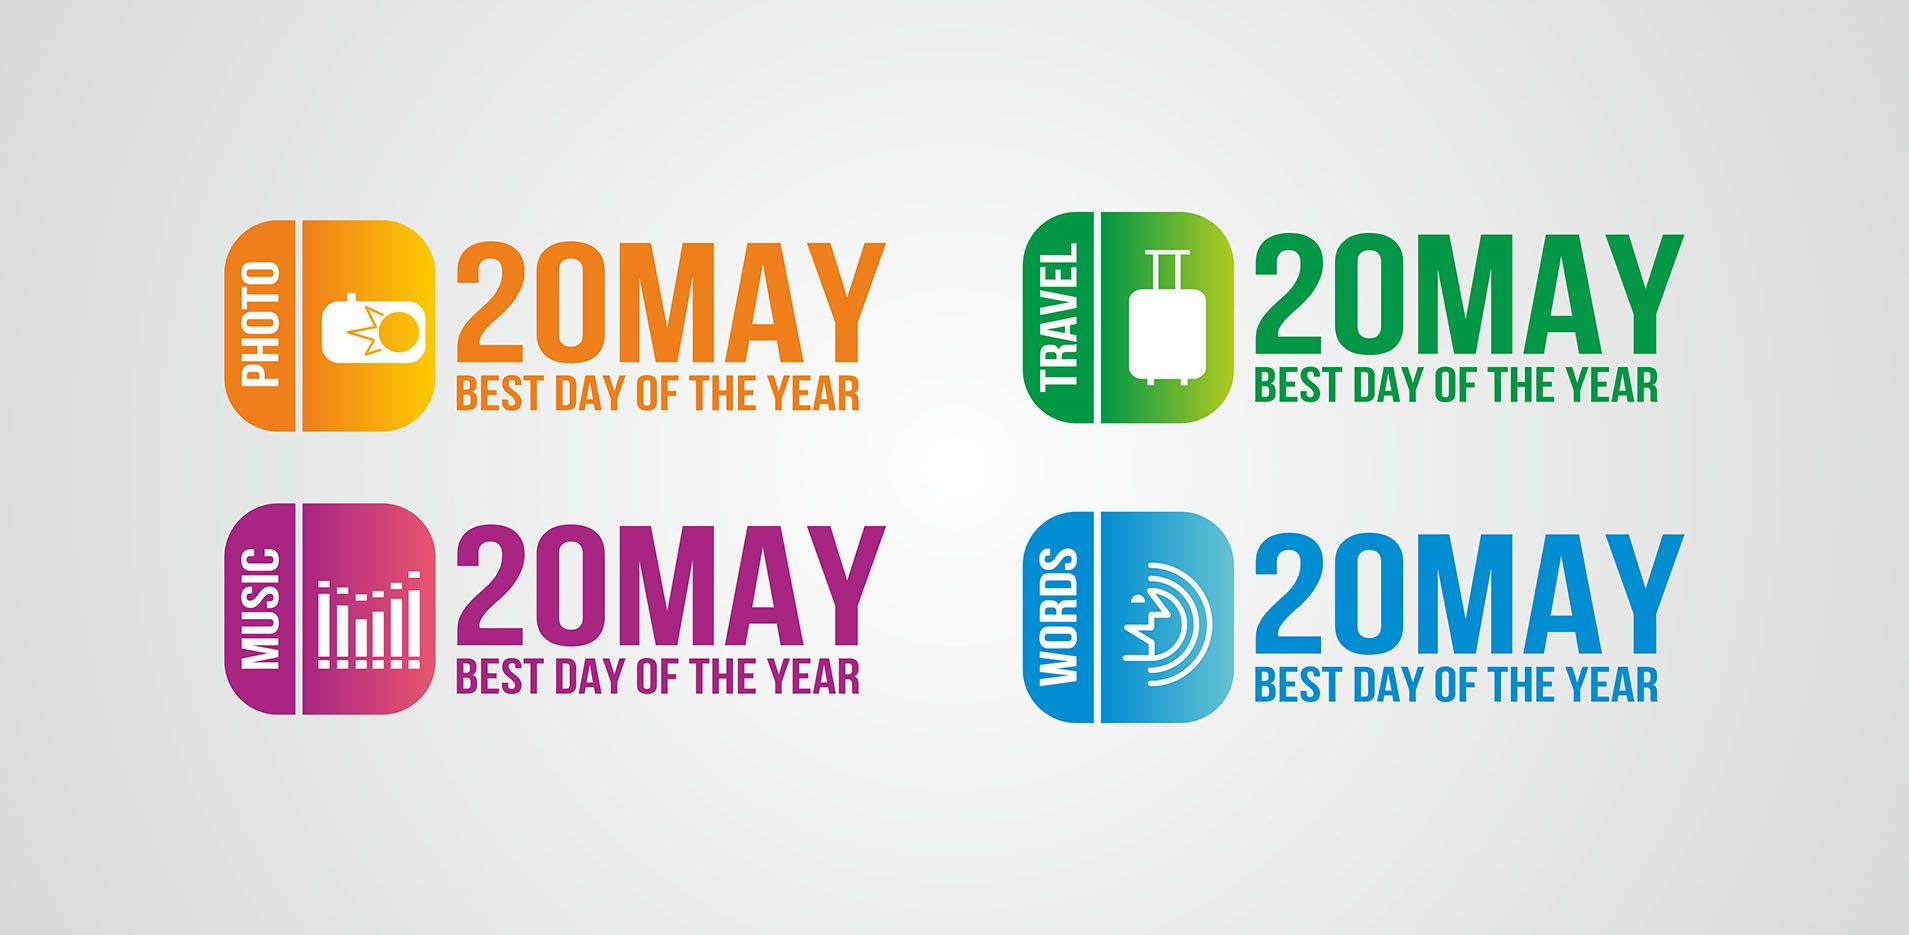 20MAY Project - дизайнер Scorp